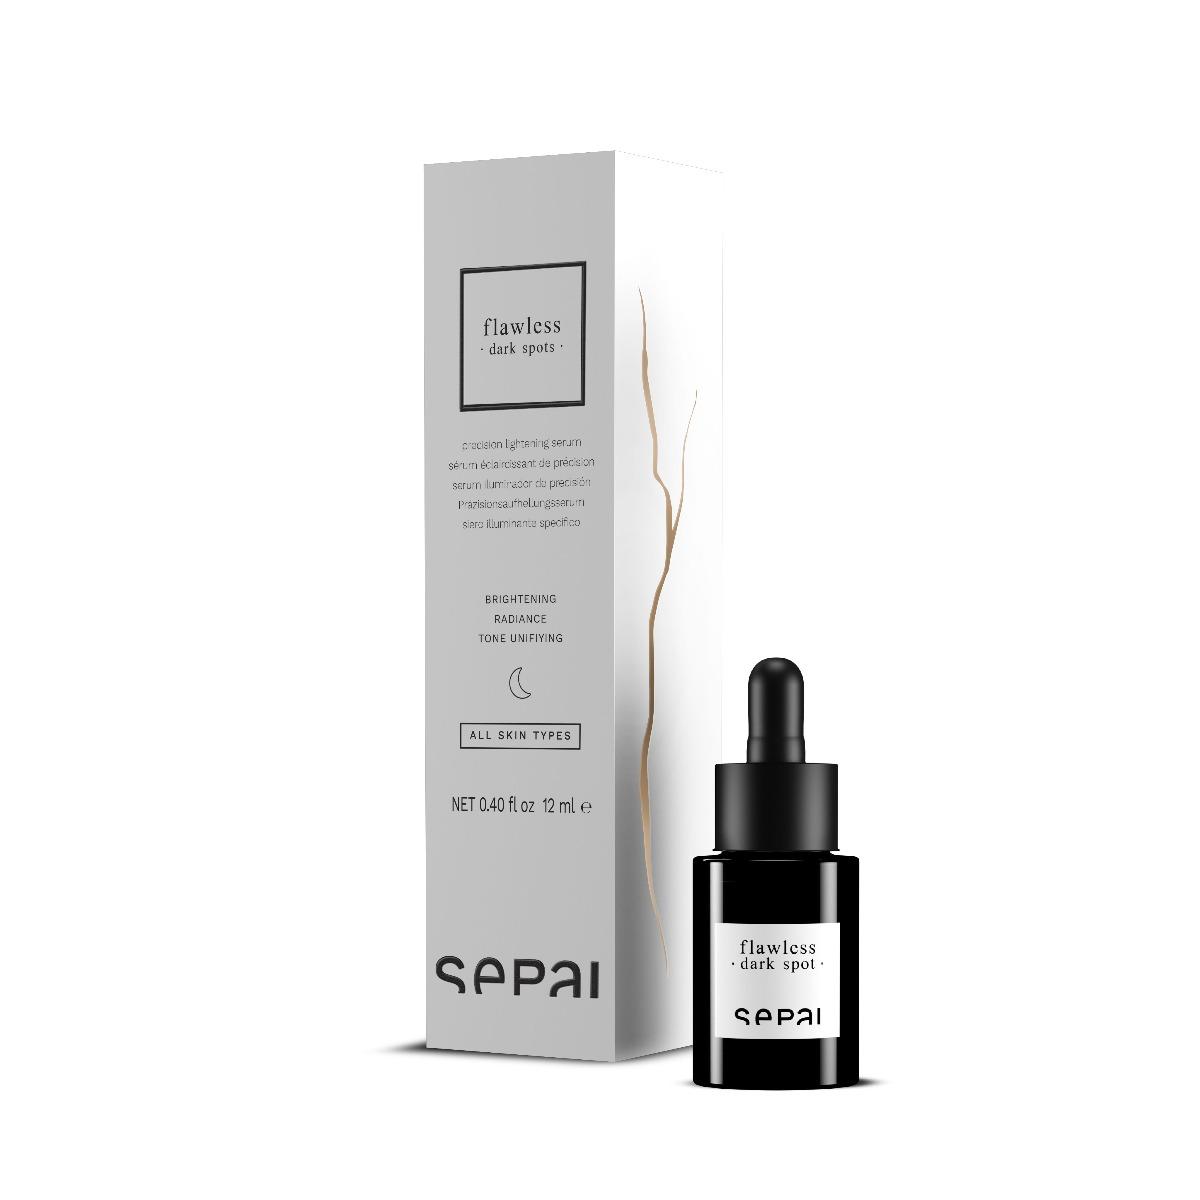 Sepai - Flawless Dark Spots - precision lightening serum - 12 ml